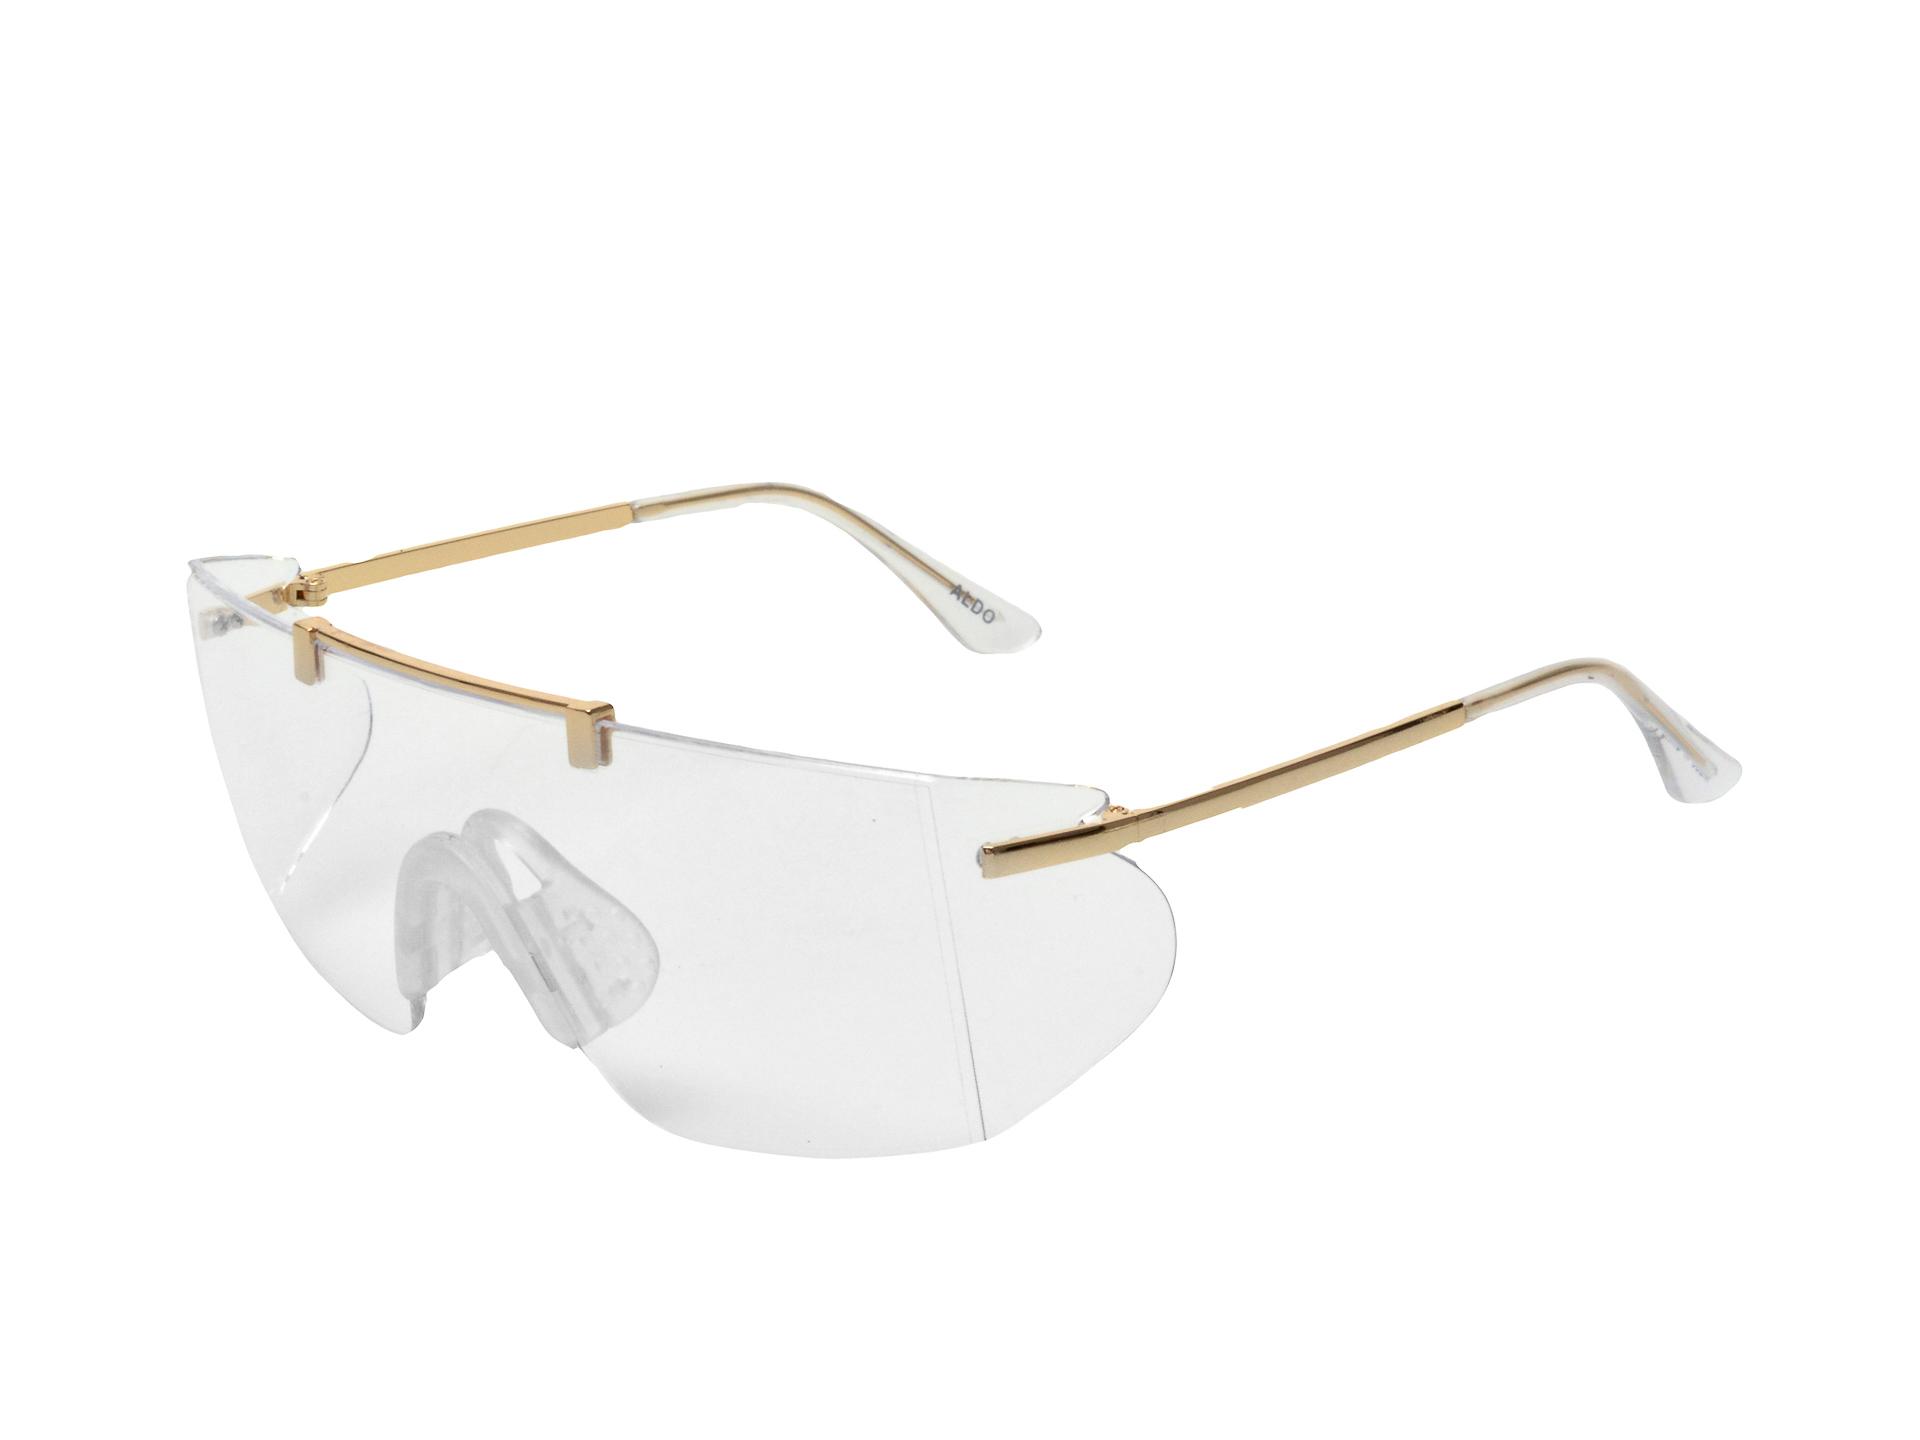 Ochelari de soare ALDO aurii, Gwenania710, din pvc imagine otter.ro 2021